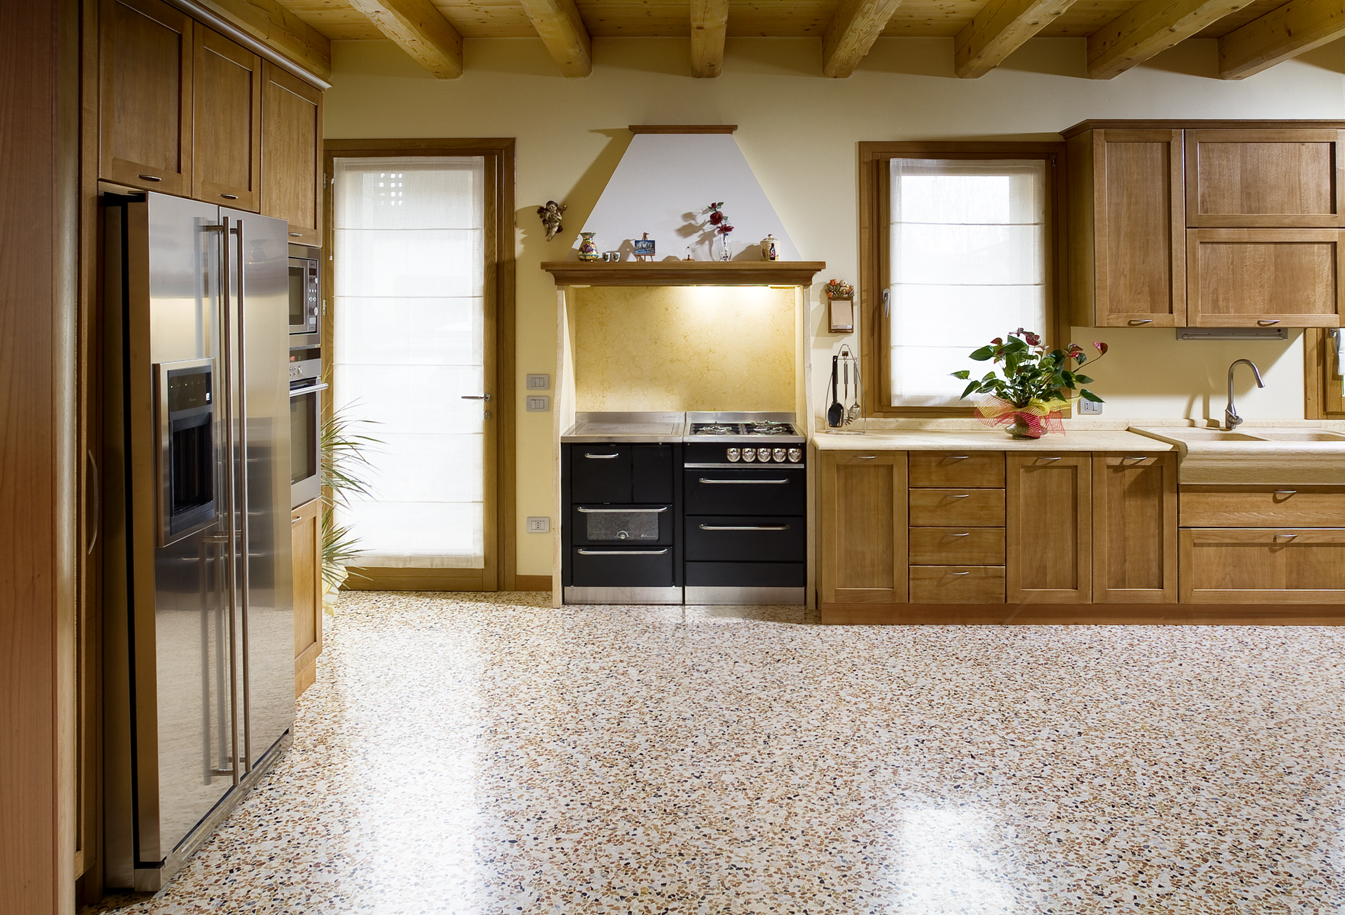 cucina stile antica imax - IMAX FALEGNAMERIA